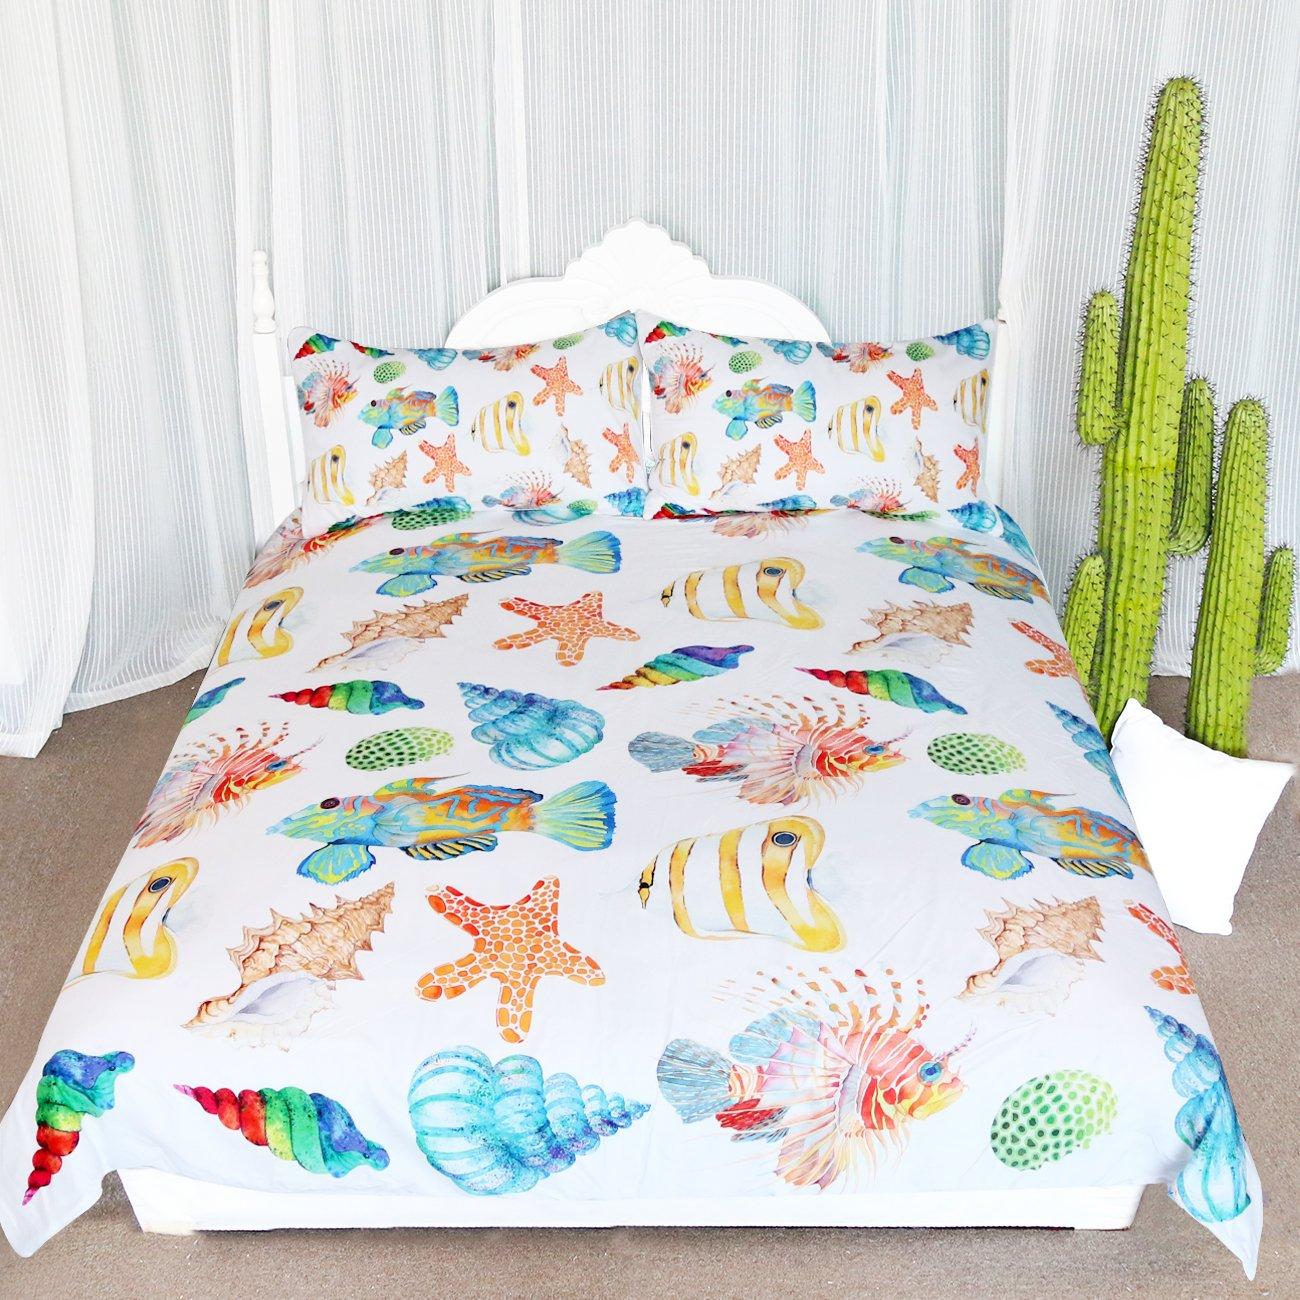 49 Beautiful Beach And Sea Themed Bedroom Designs: Ocean Themed Bedding: Amazon.com